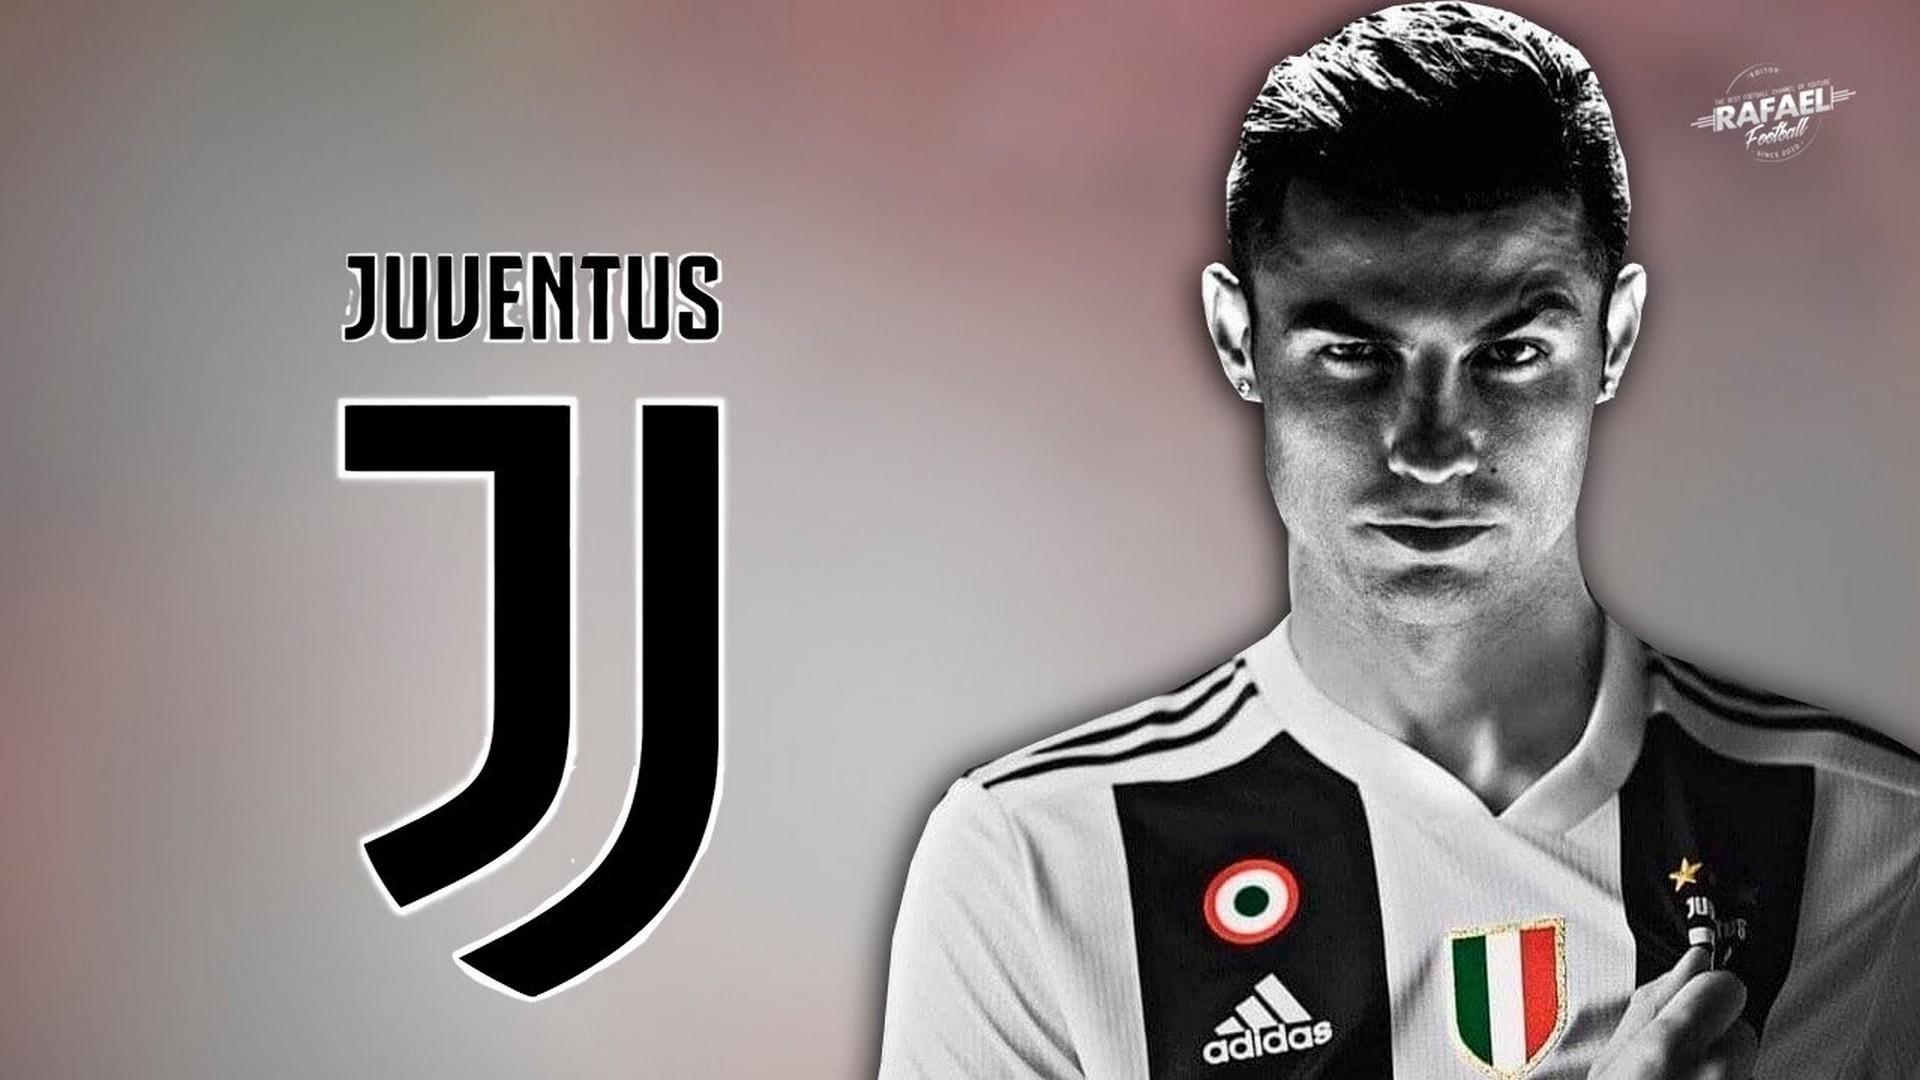 Wallpaper Cristiano Ronaldo Juventus Hd With Resolution Ronaldo Juventus Foto Hd 1920x1080 Download Hd Wallpaper Wallpapertip